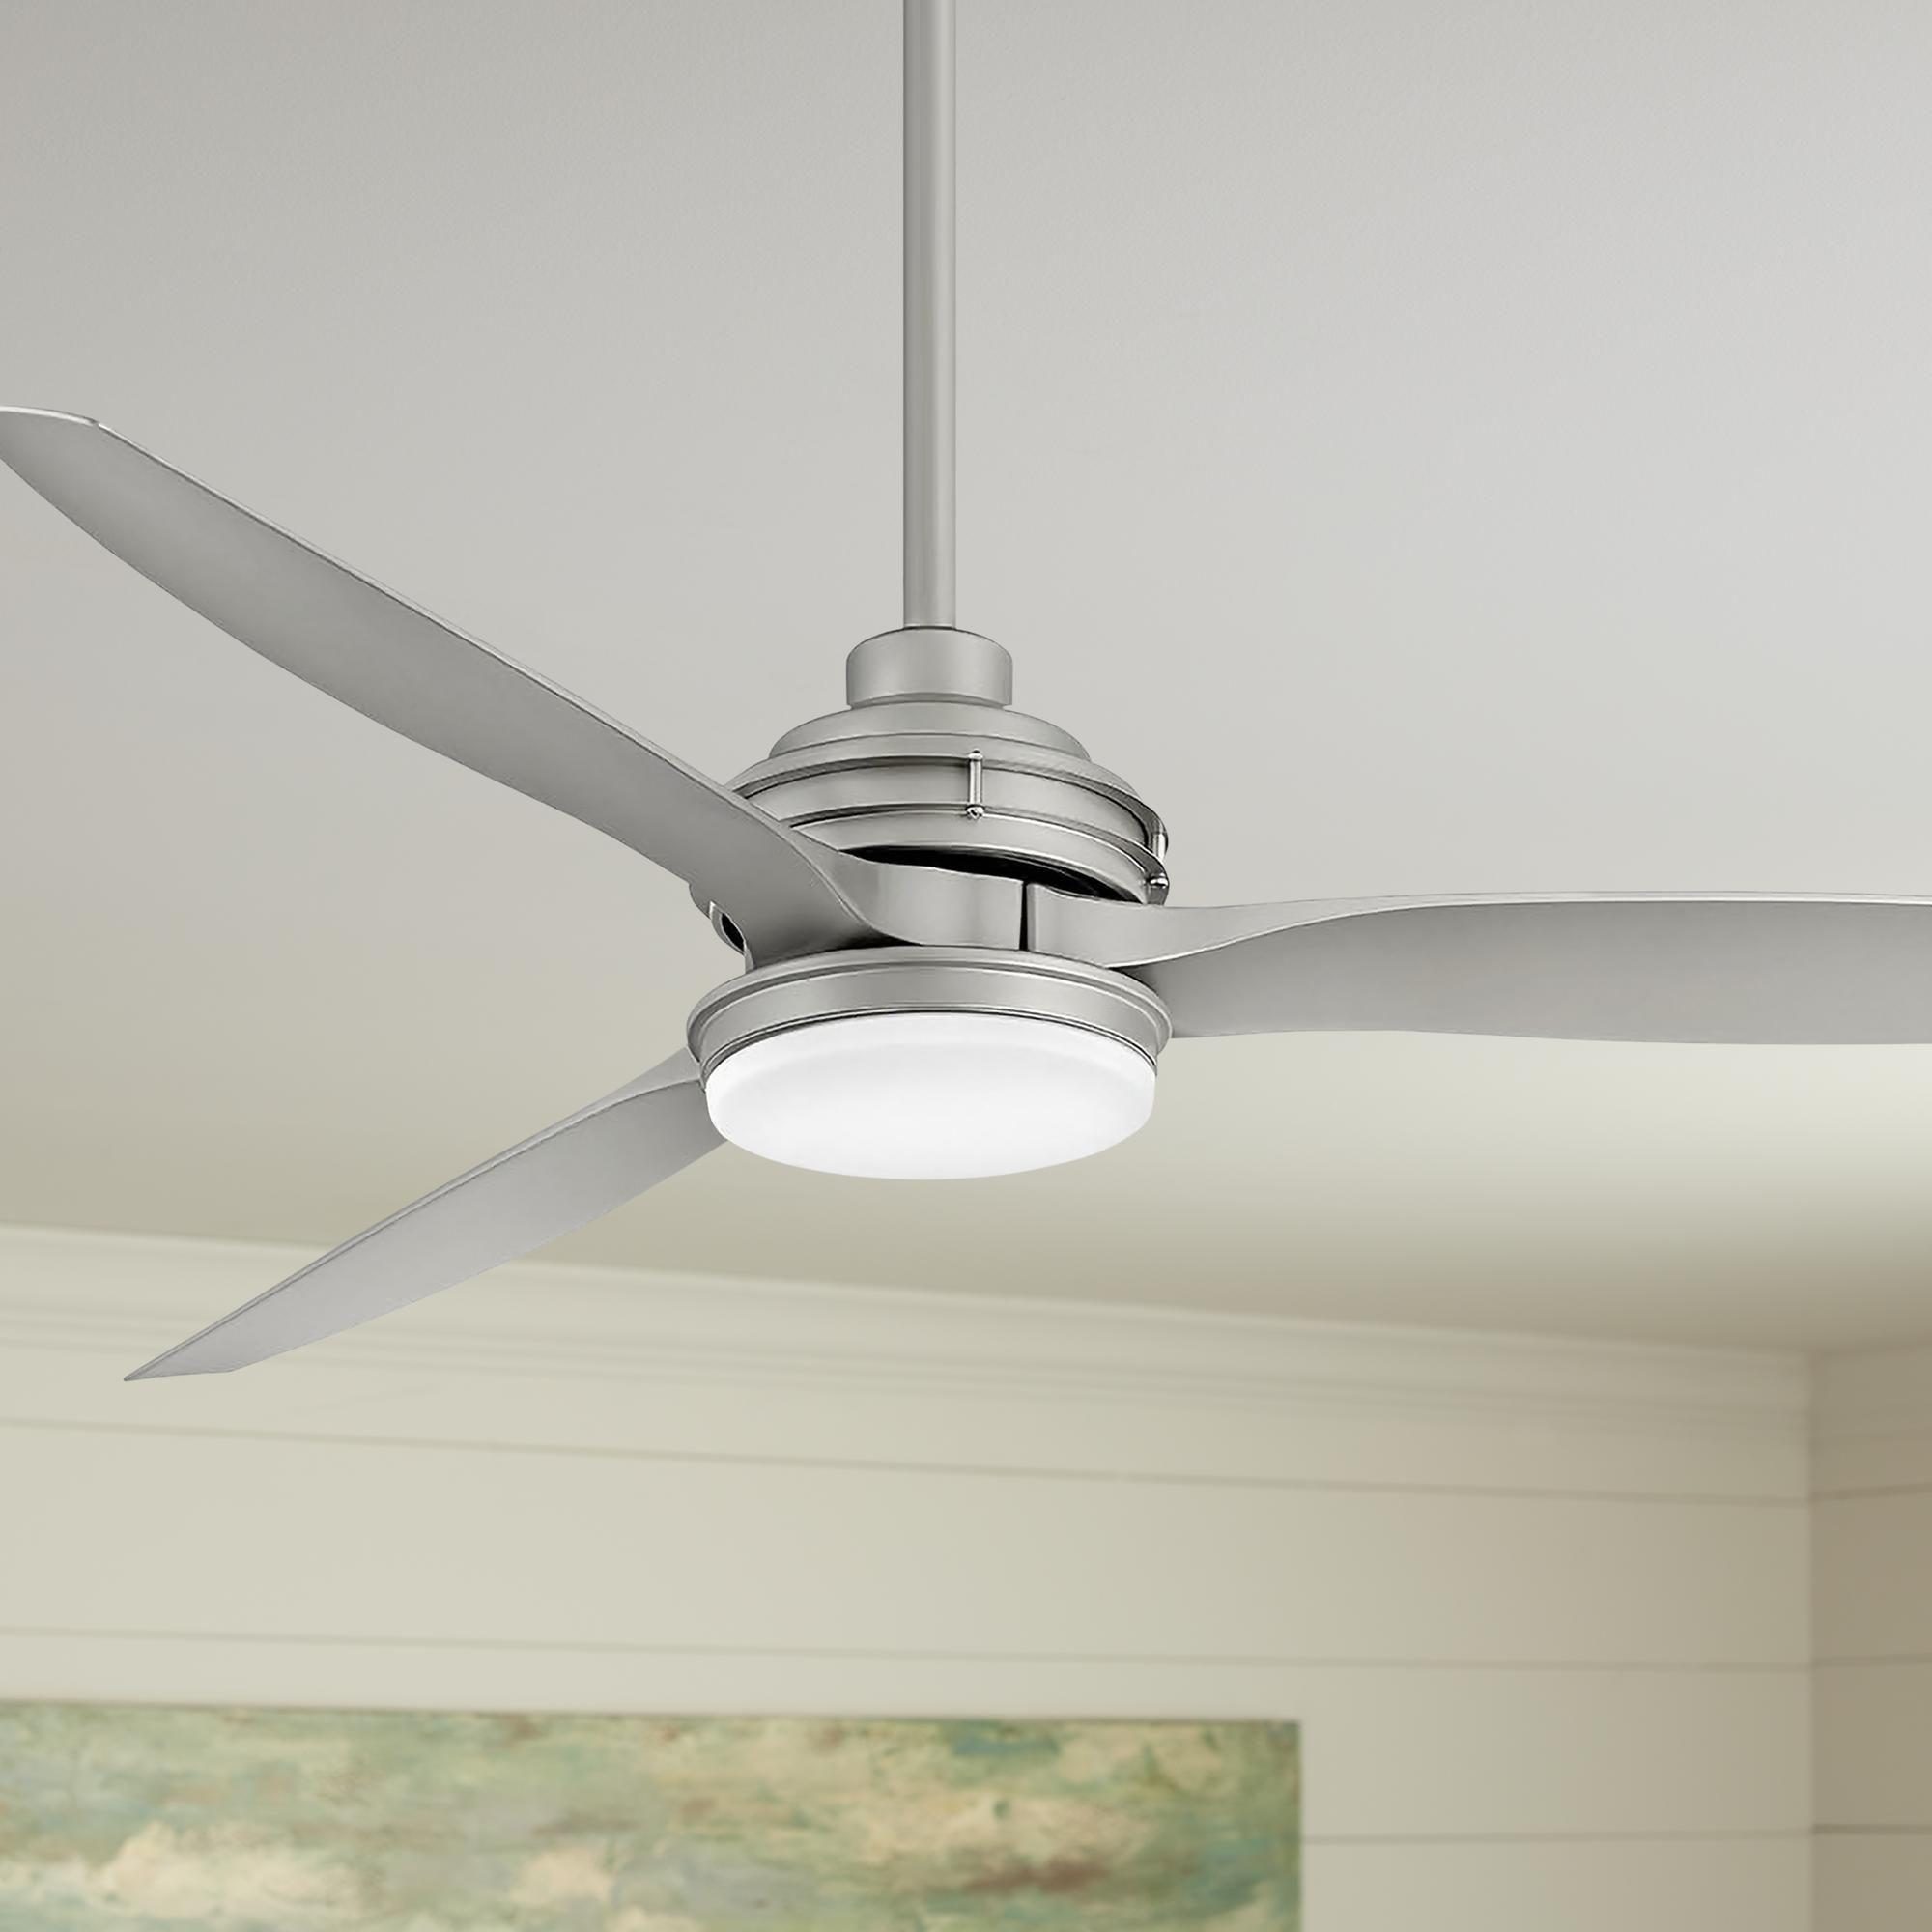 60 Inch Hinkley Artiste Brushed Nickel Led Wet Rated Ceiling Fan